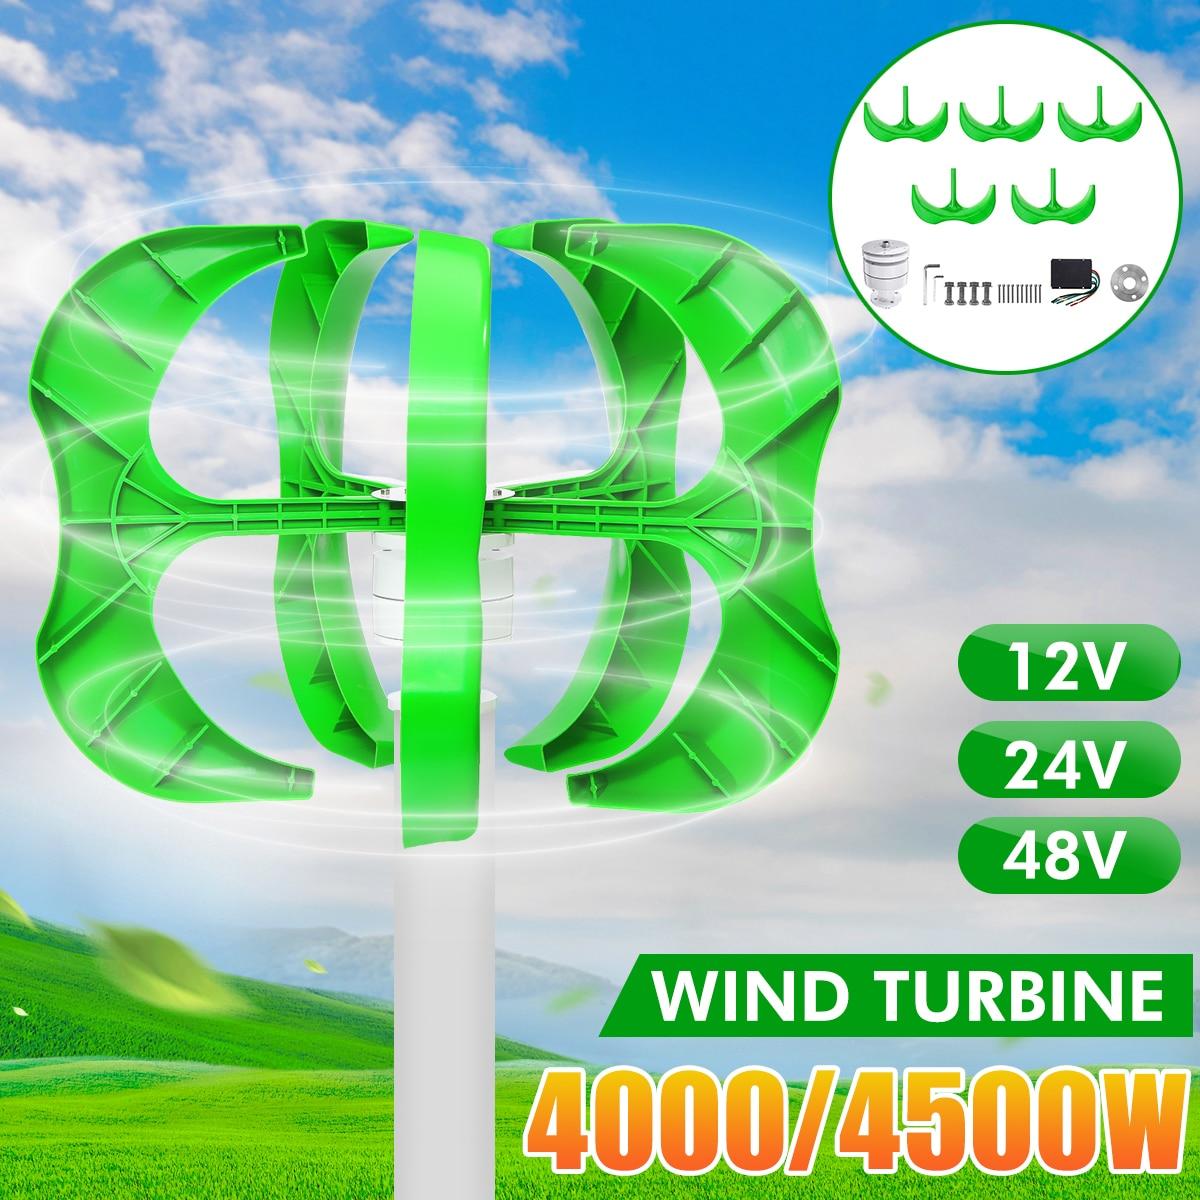 4500W/4000W Wind Generator 12/24/48V 5 Blades generator Lantern wind turbines Vertical Axis For Household Streetlight+Controller